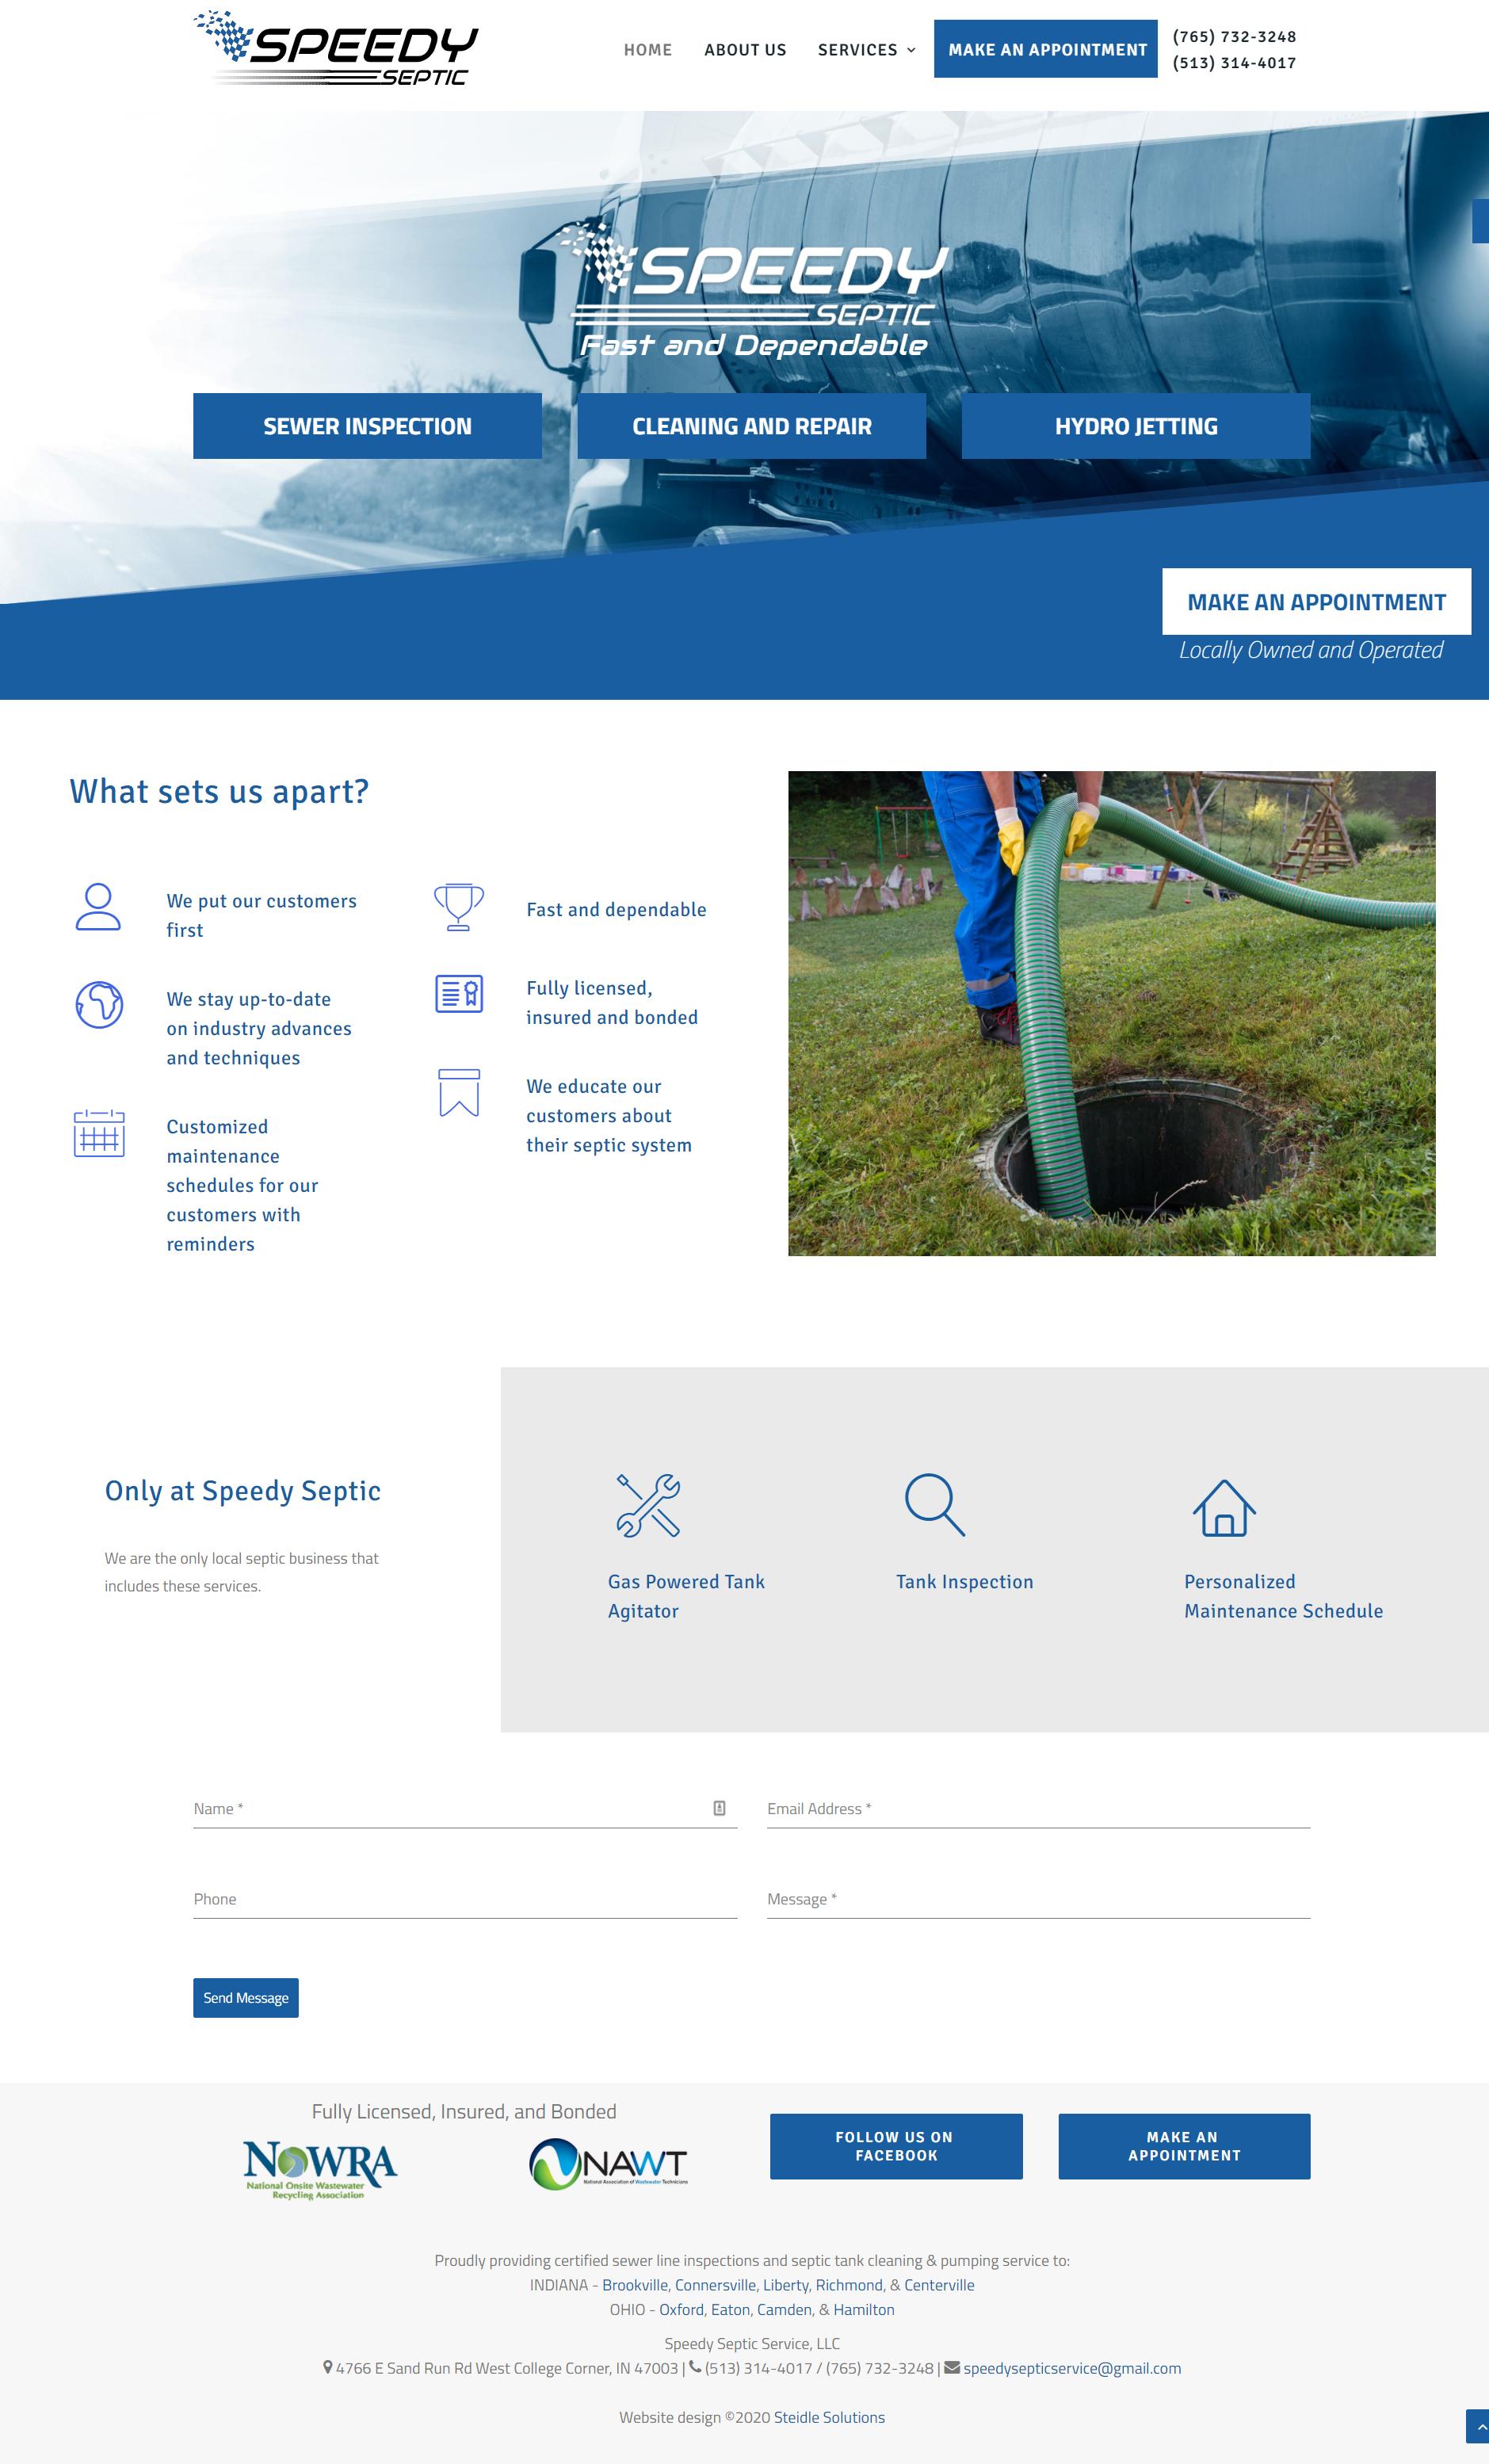 Speedy Septic Homepage